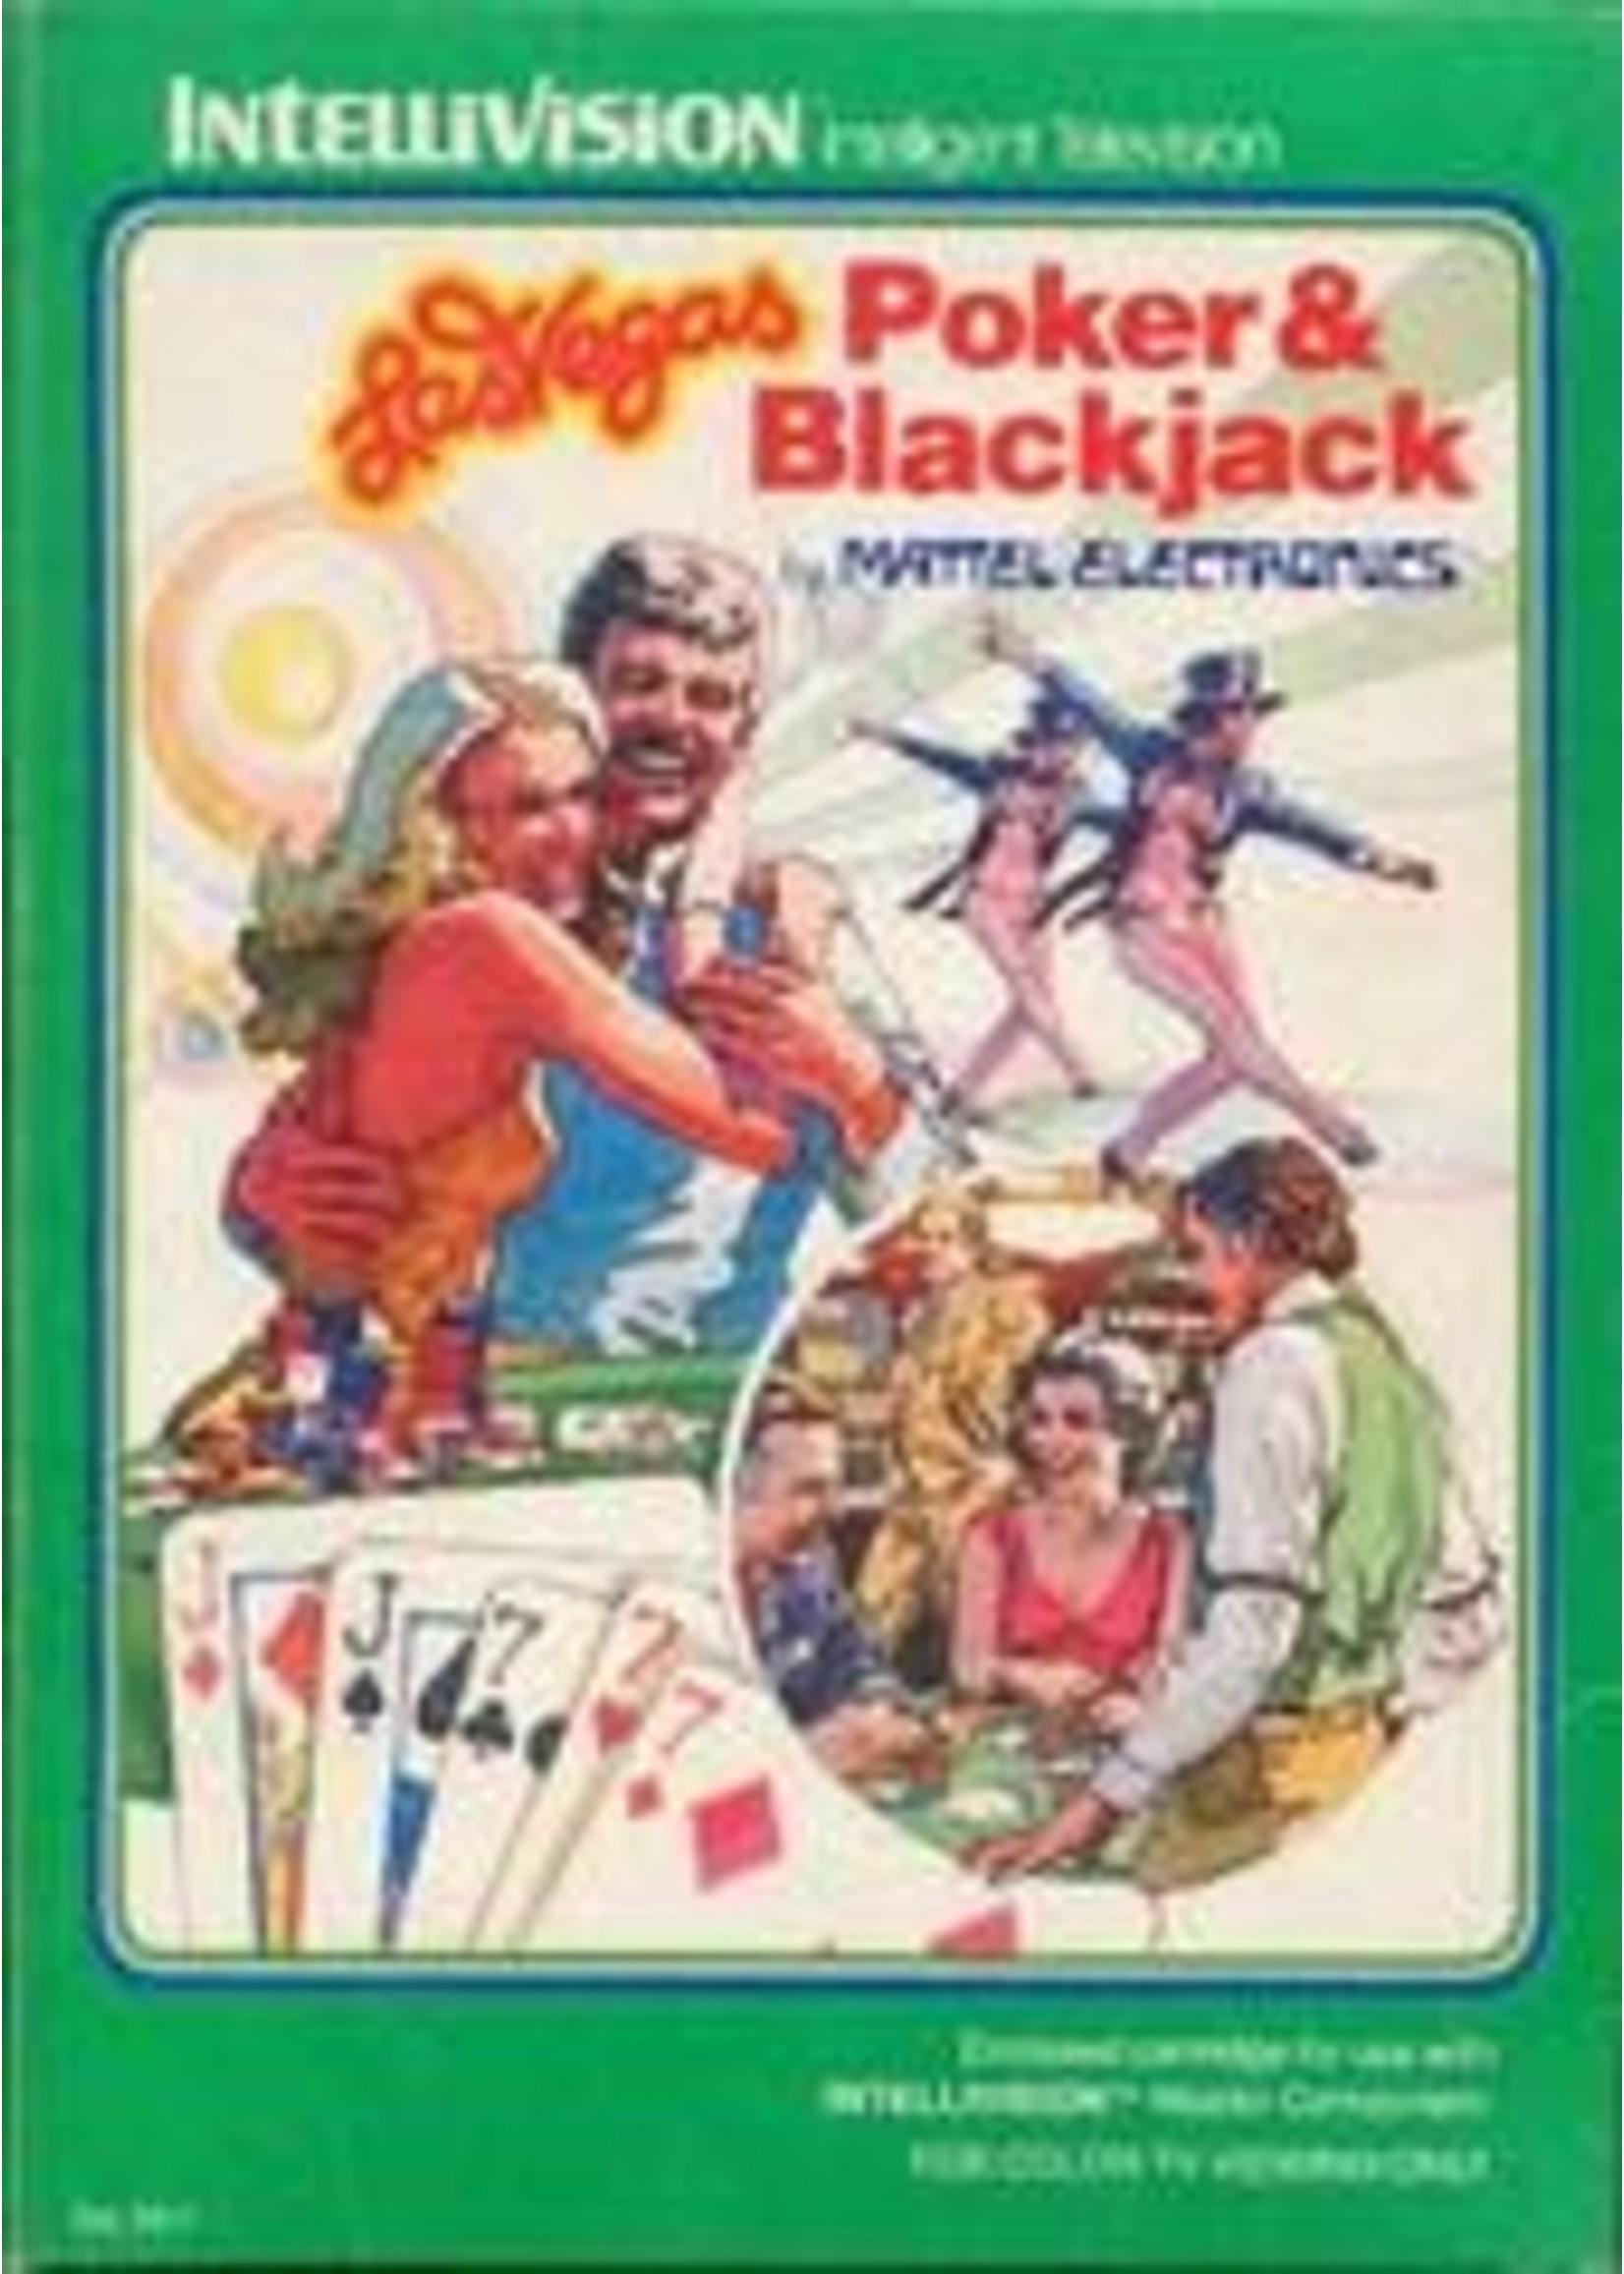 Las Vegas Poker & Blackjack Intellivision